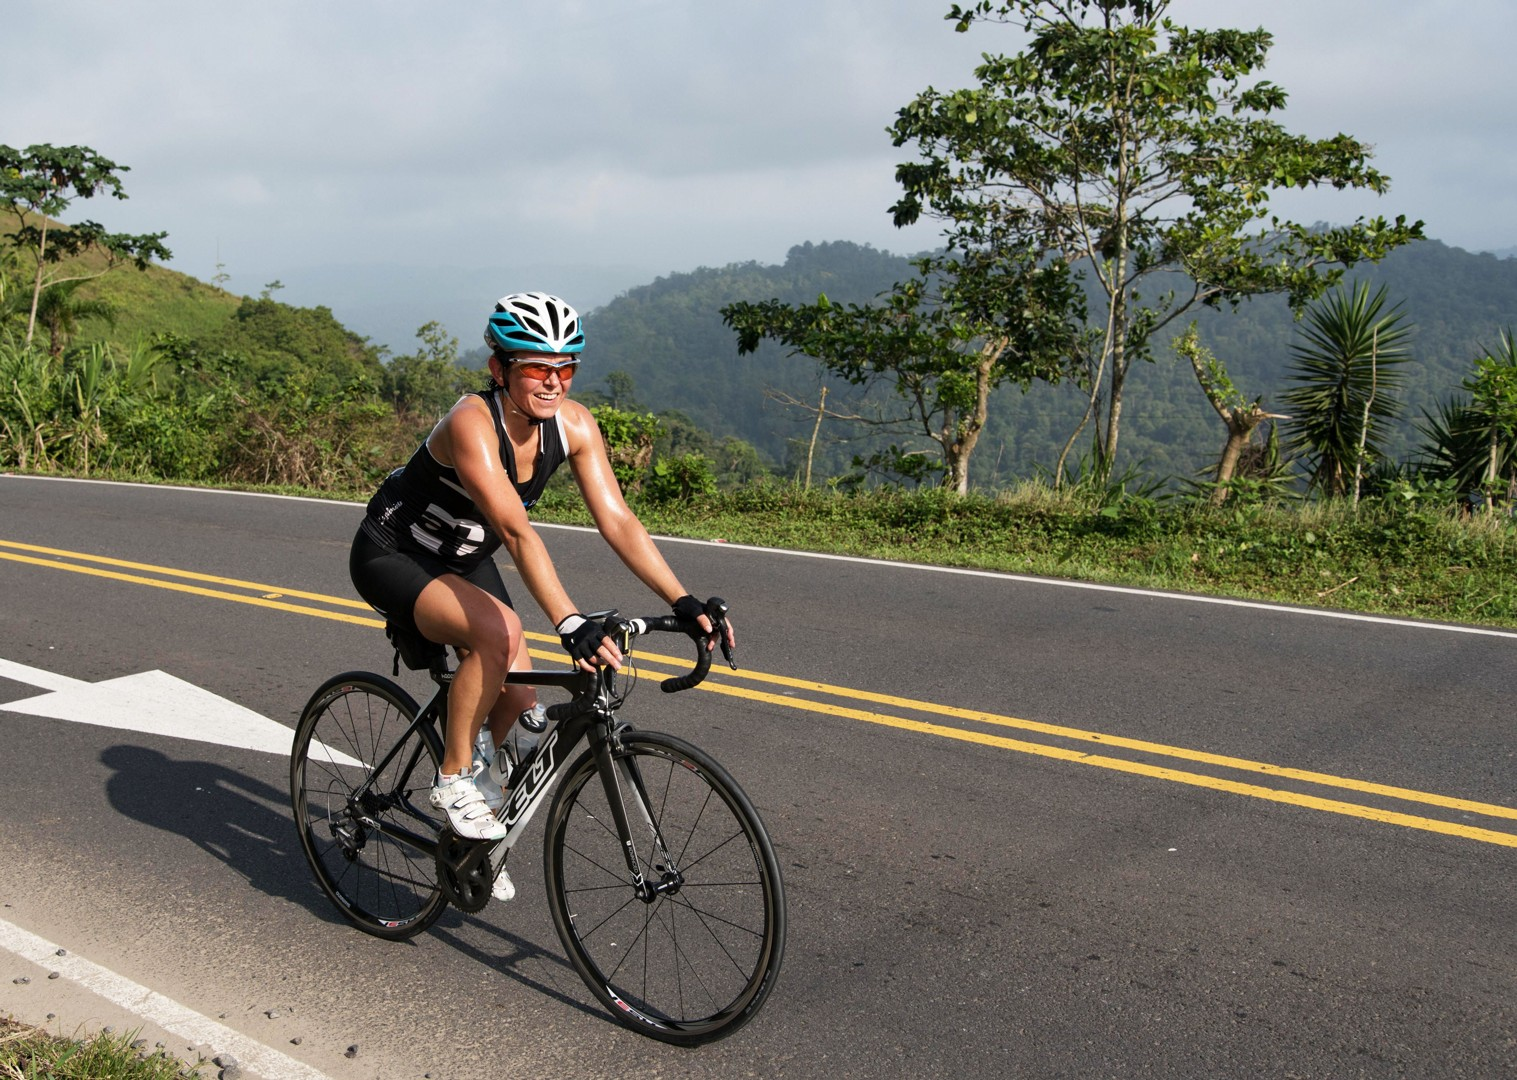 San-jose-guided-road-cycling-holiday-ruta-de-los-volcanes-costa-rica.jpg - Costa Rica - Ruta de los Volcanes - Road Cycling